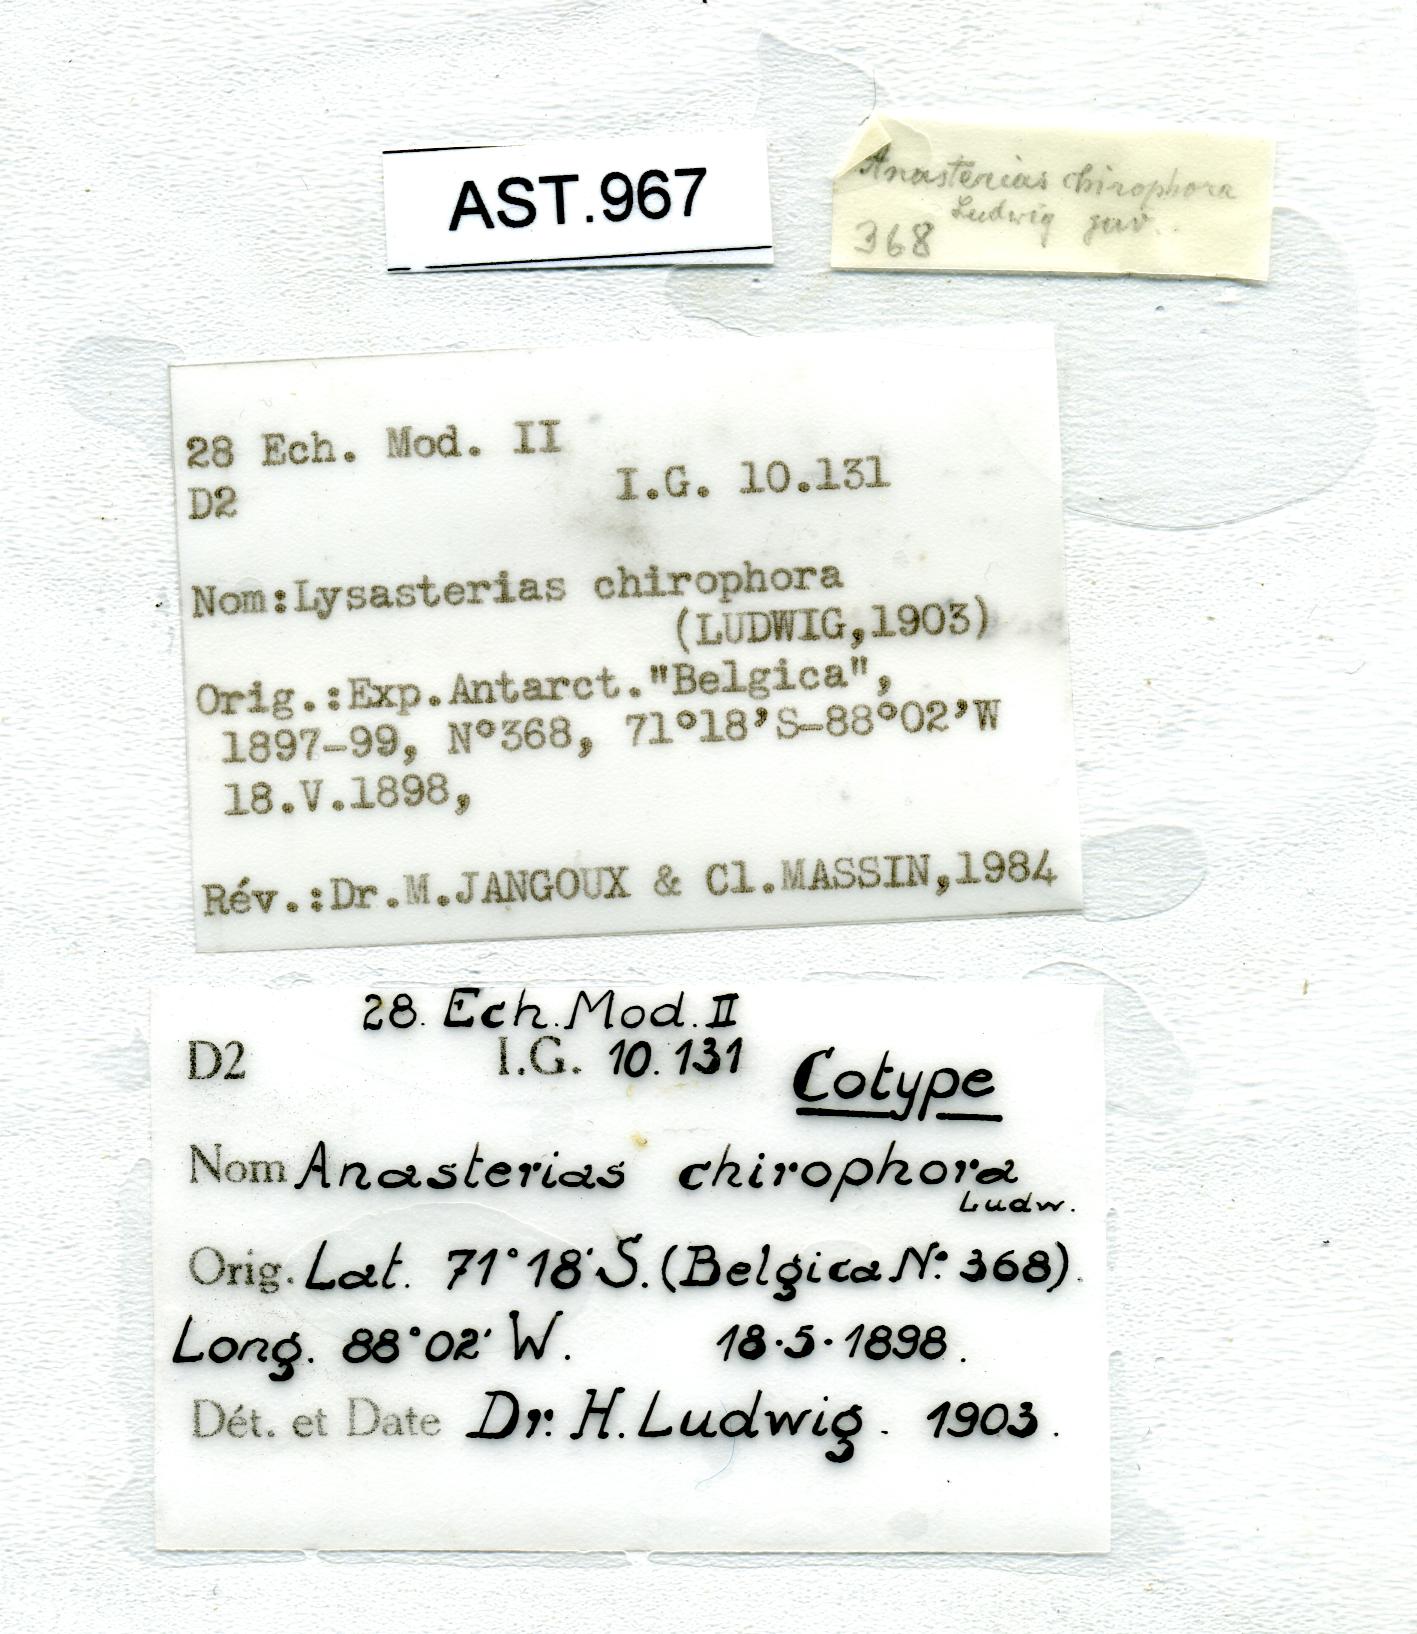 BE-RBINS-INV SYNTYPE AST.967 Anasterias chiridophora LABELS.jpg